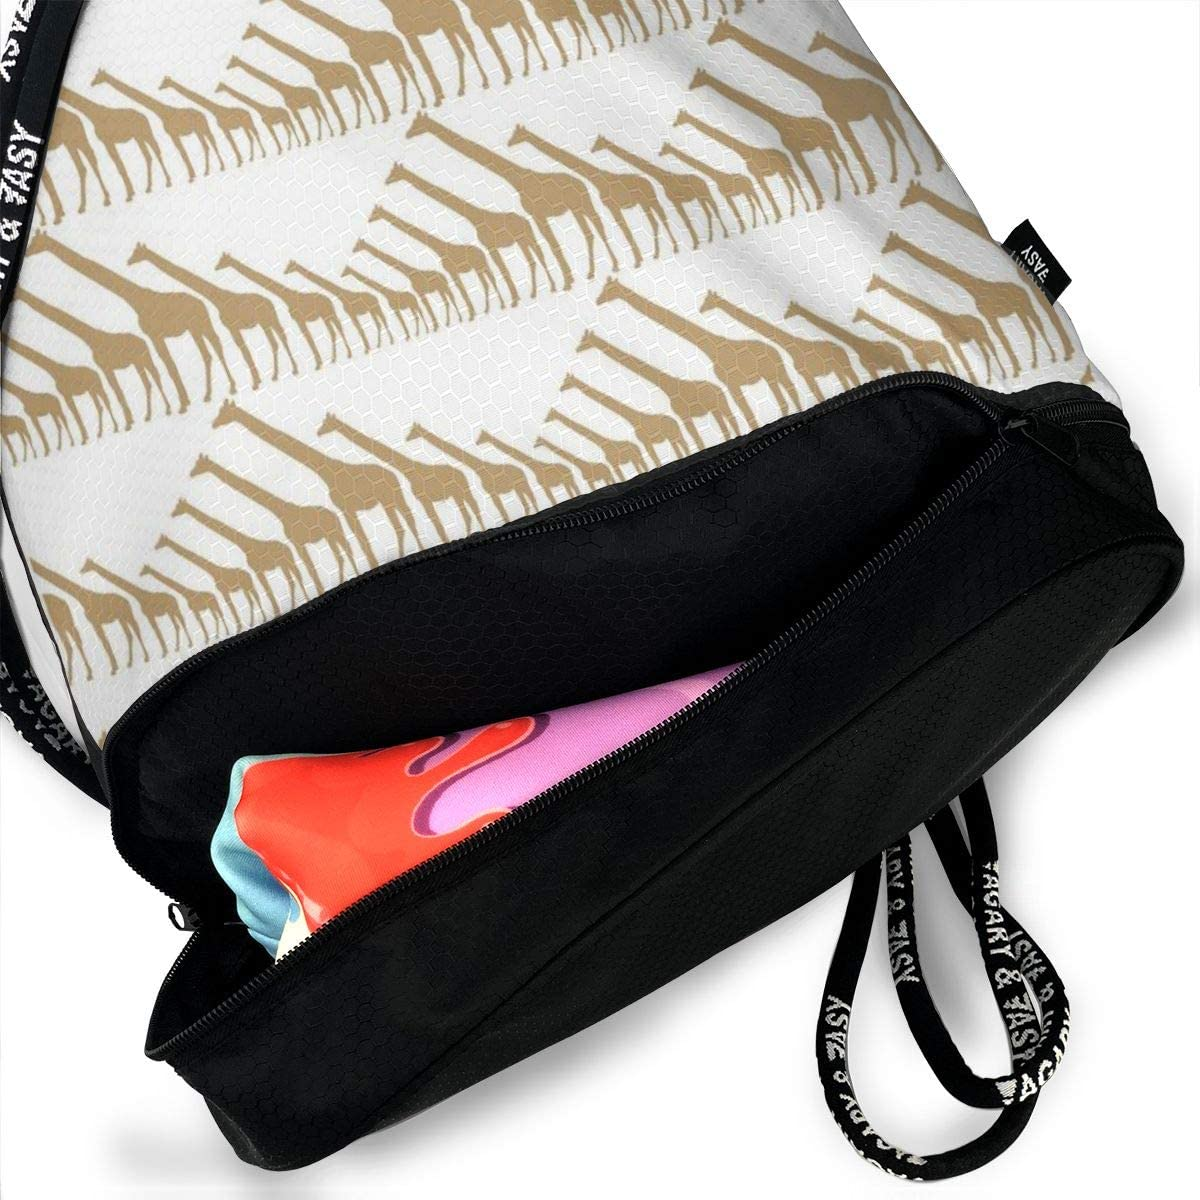 GymSack Drawstring Bag Sackpack Giraffe Print Sport Cinch Pack Simple Bundle Pocke Backpack For Men Women